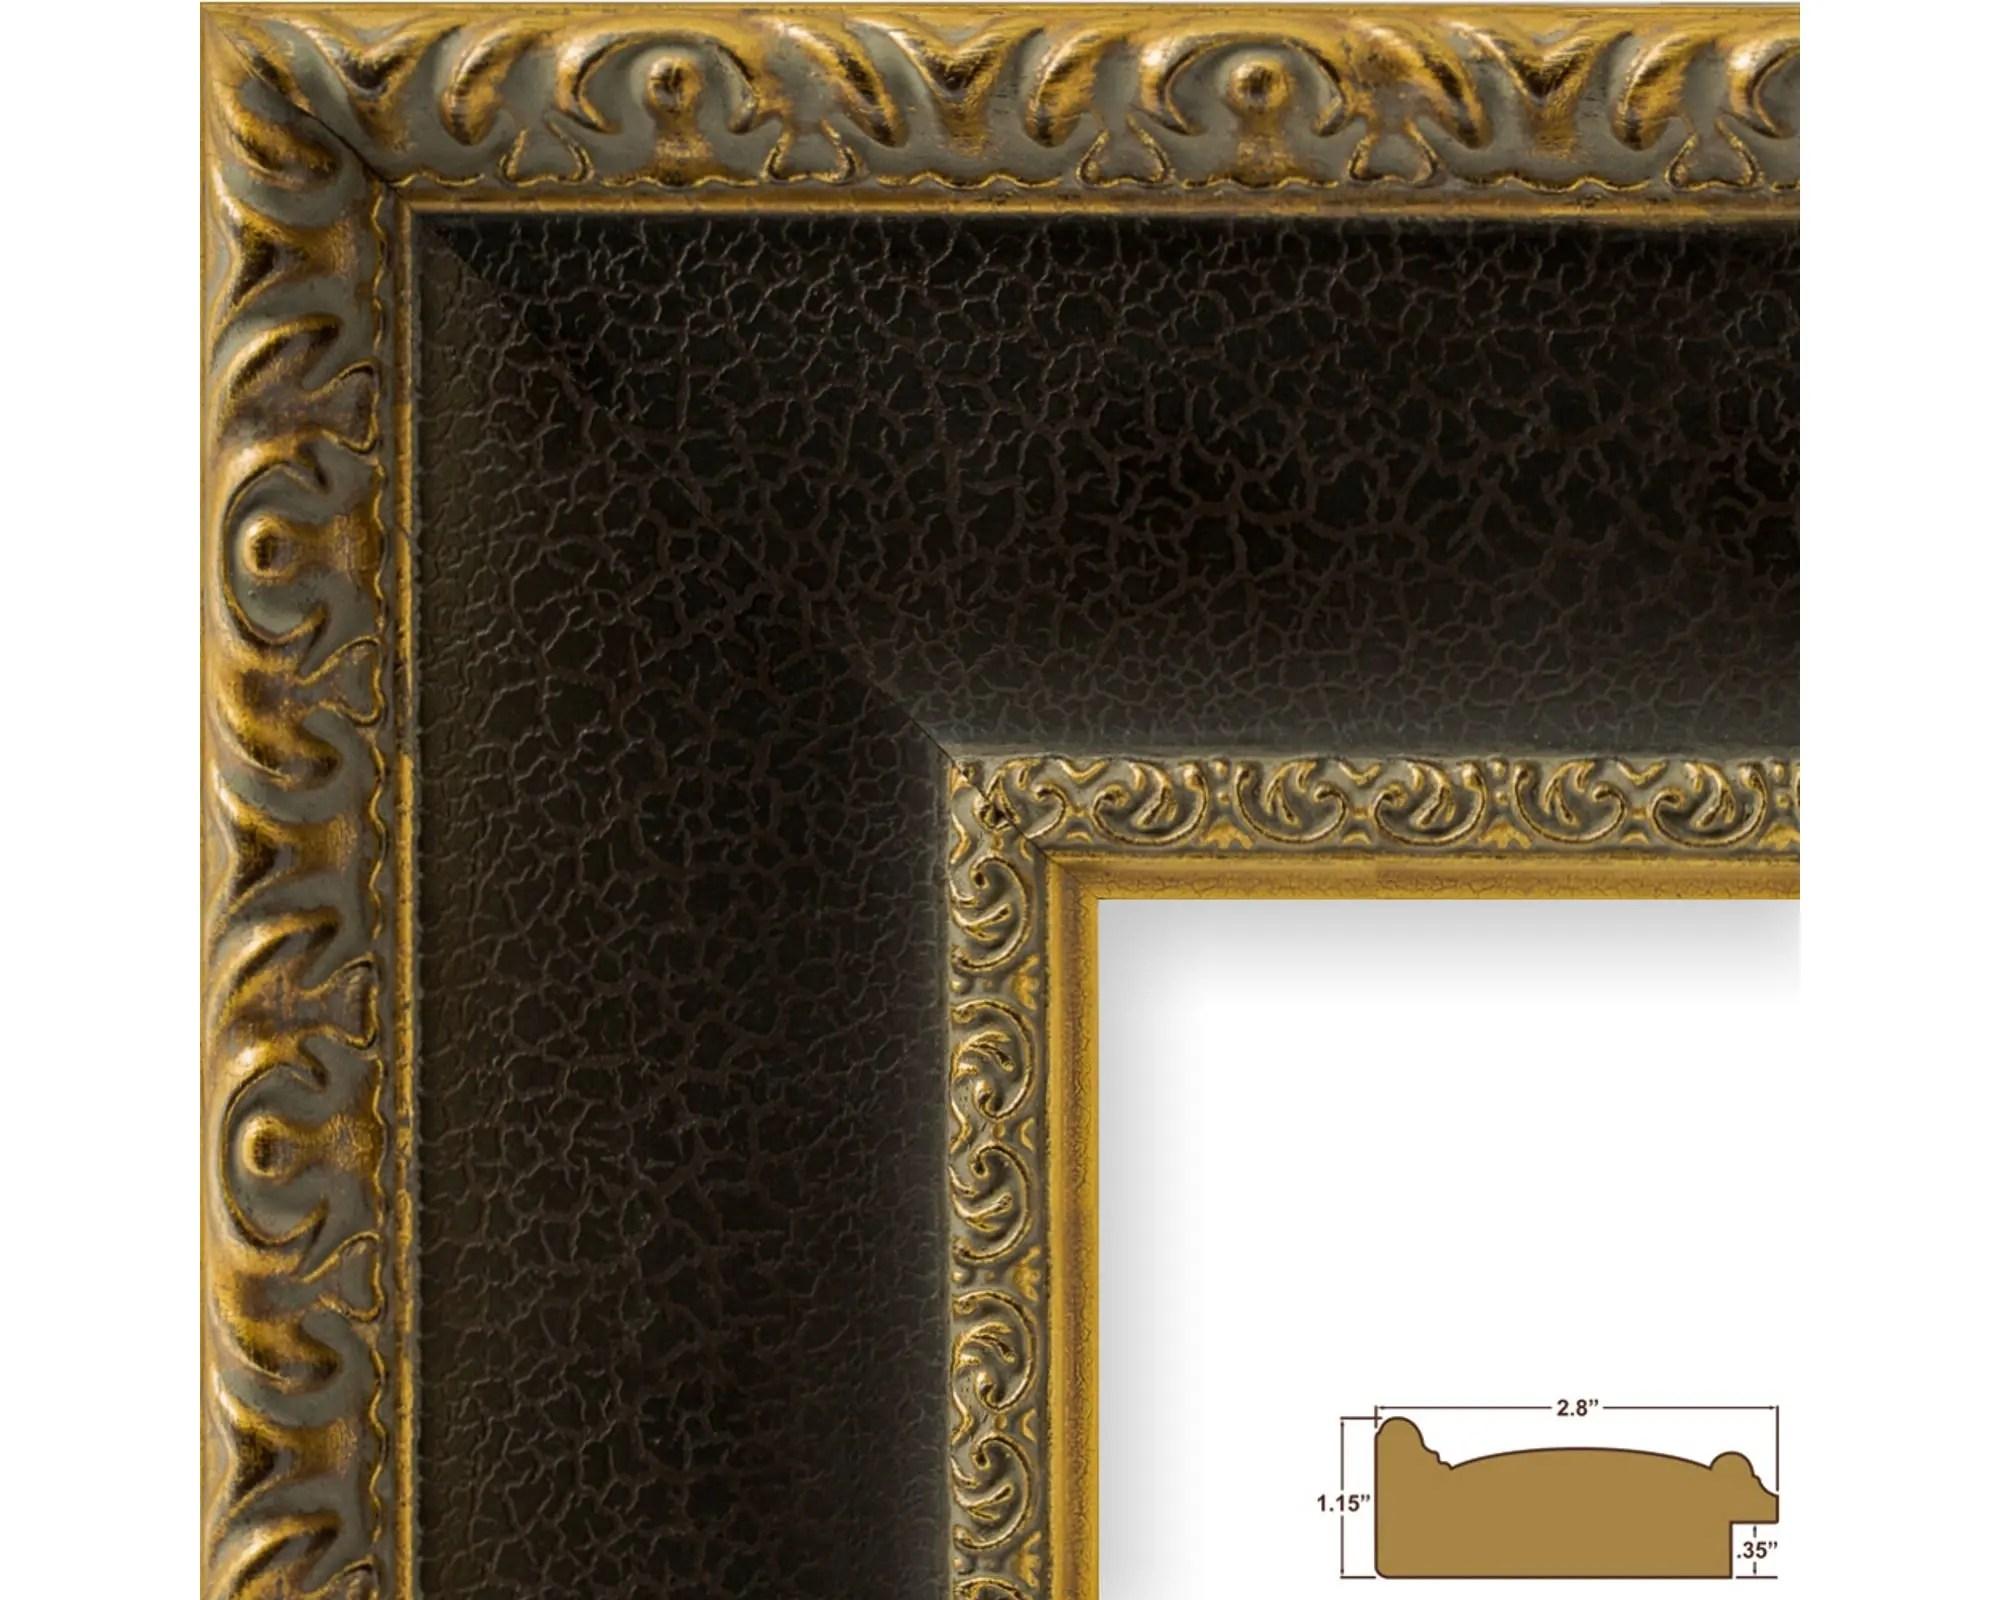 galerie 2 8 wide craig frames 92441824